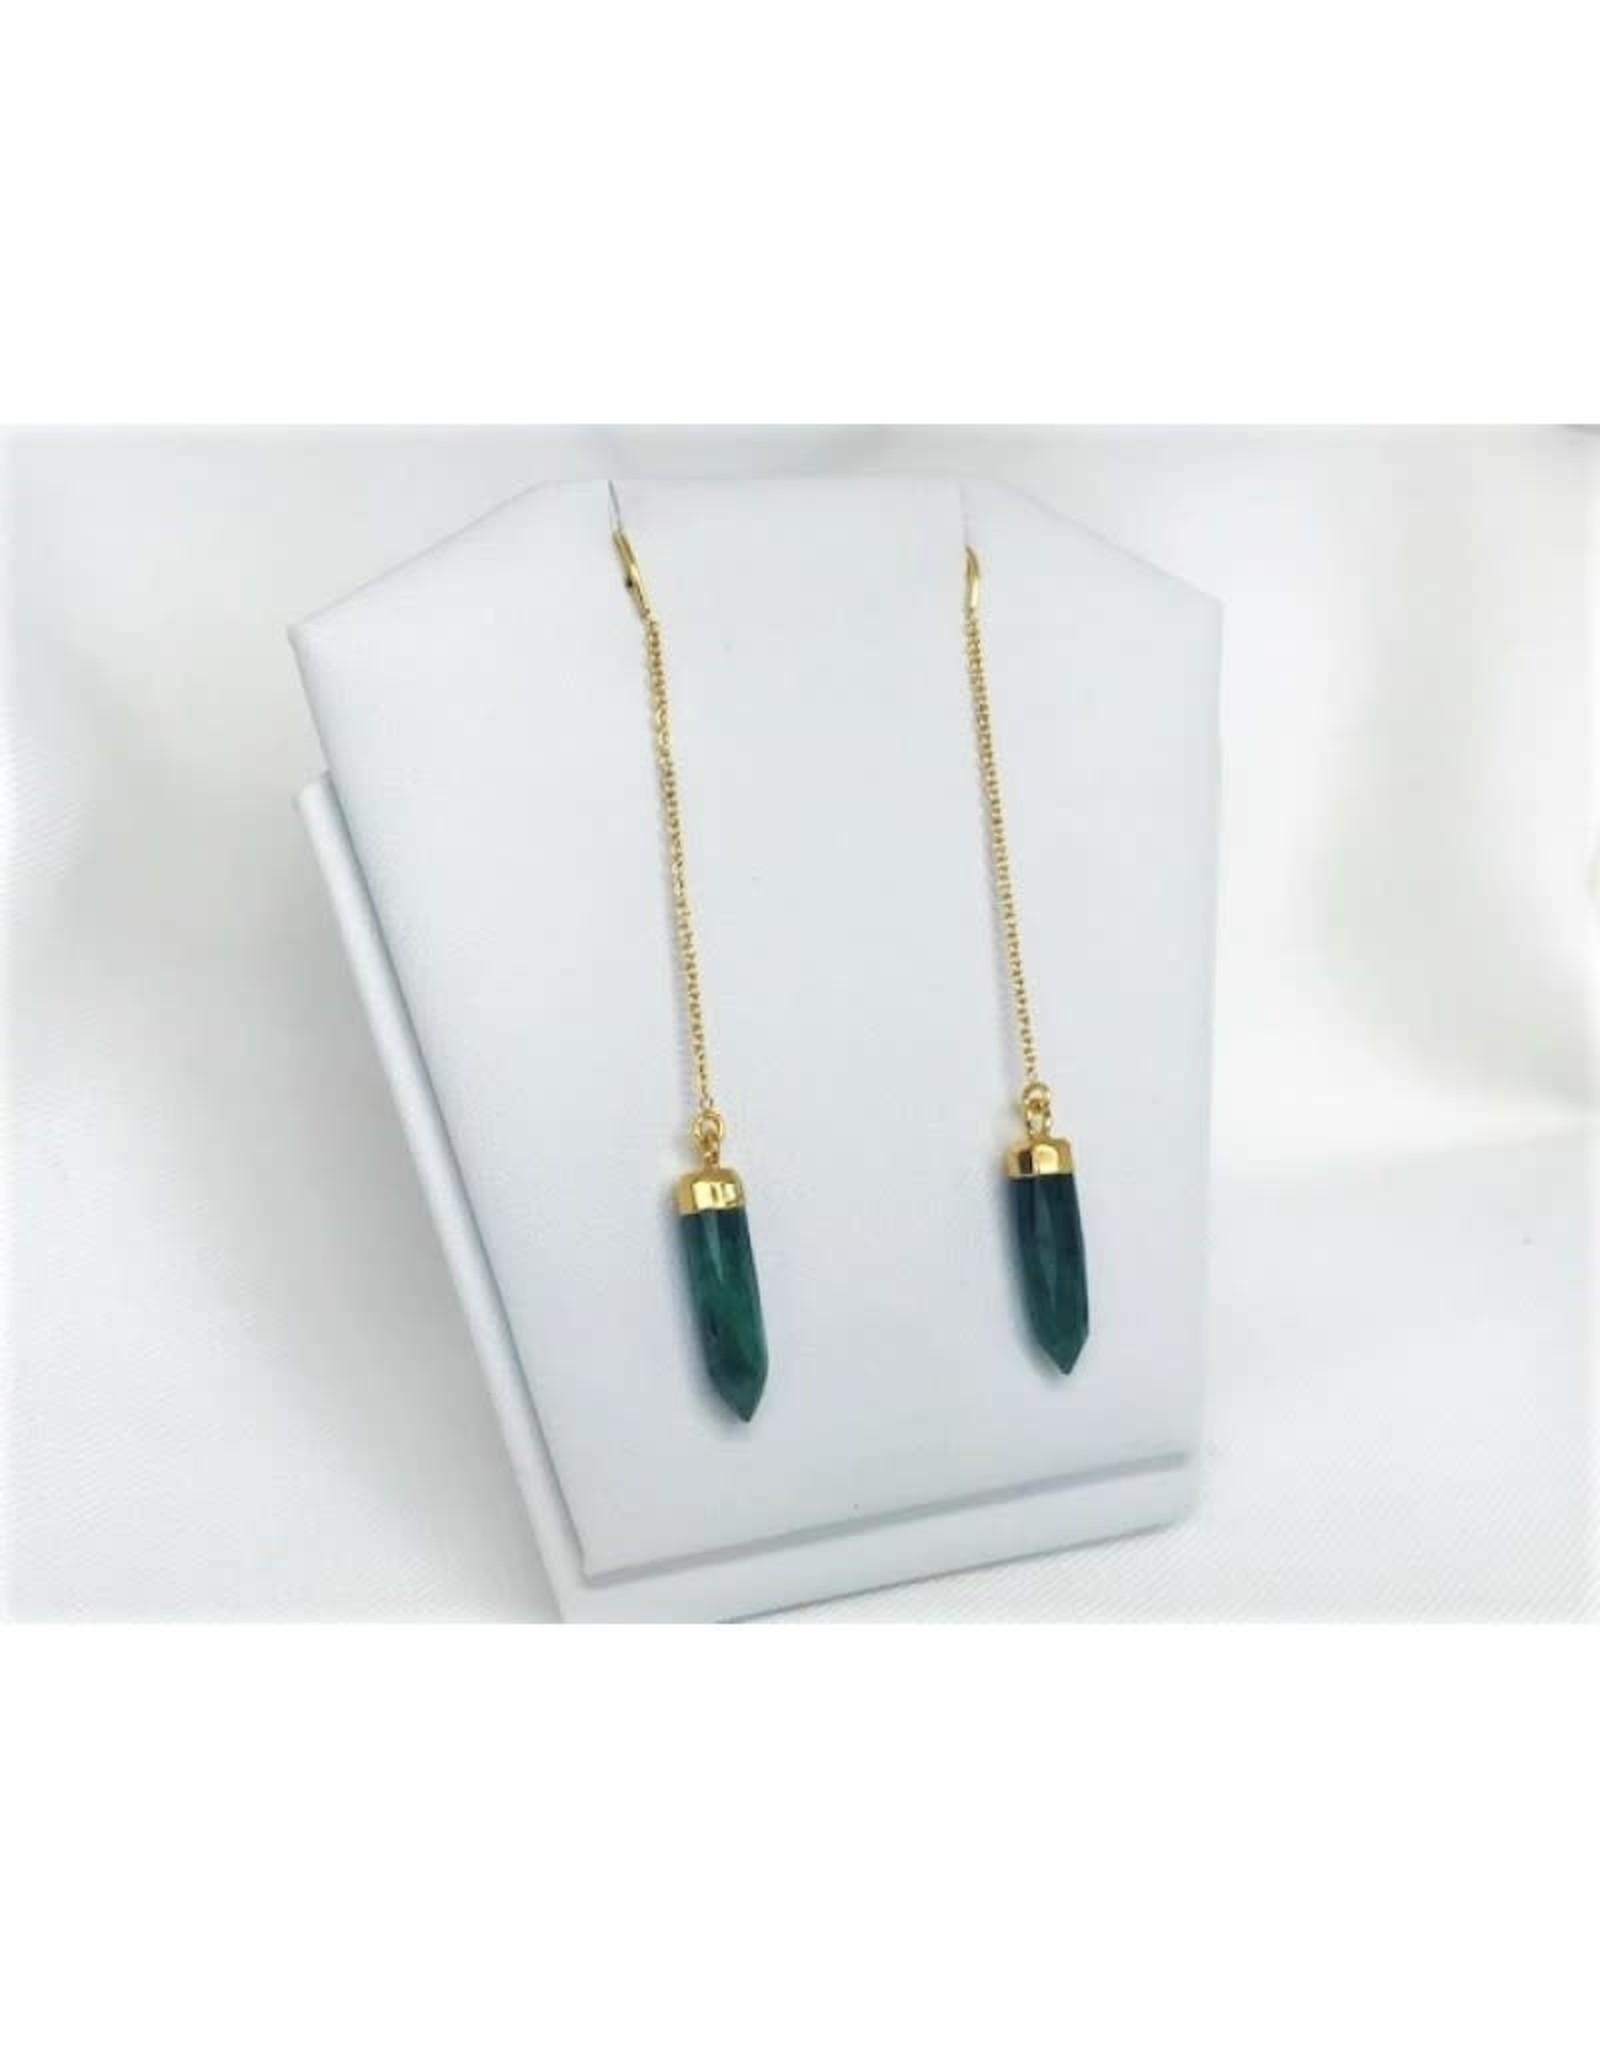 Thread Through Earrings - Raw Emerald/Gold